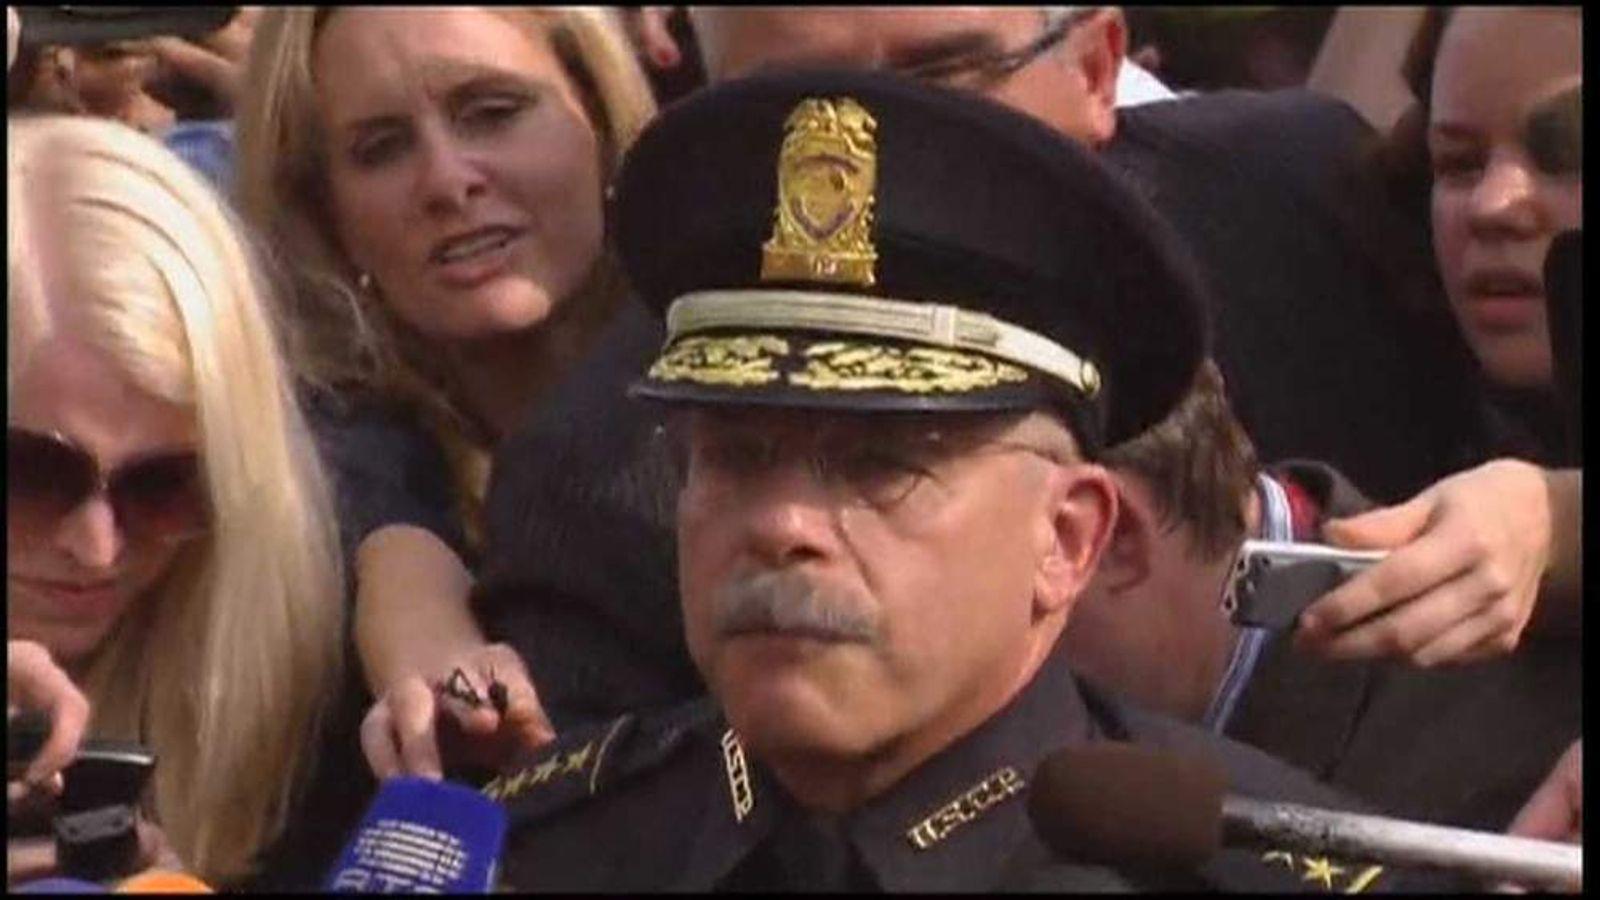 Capitol Police Chief Kim Dine